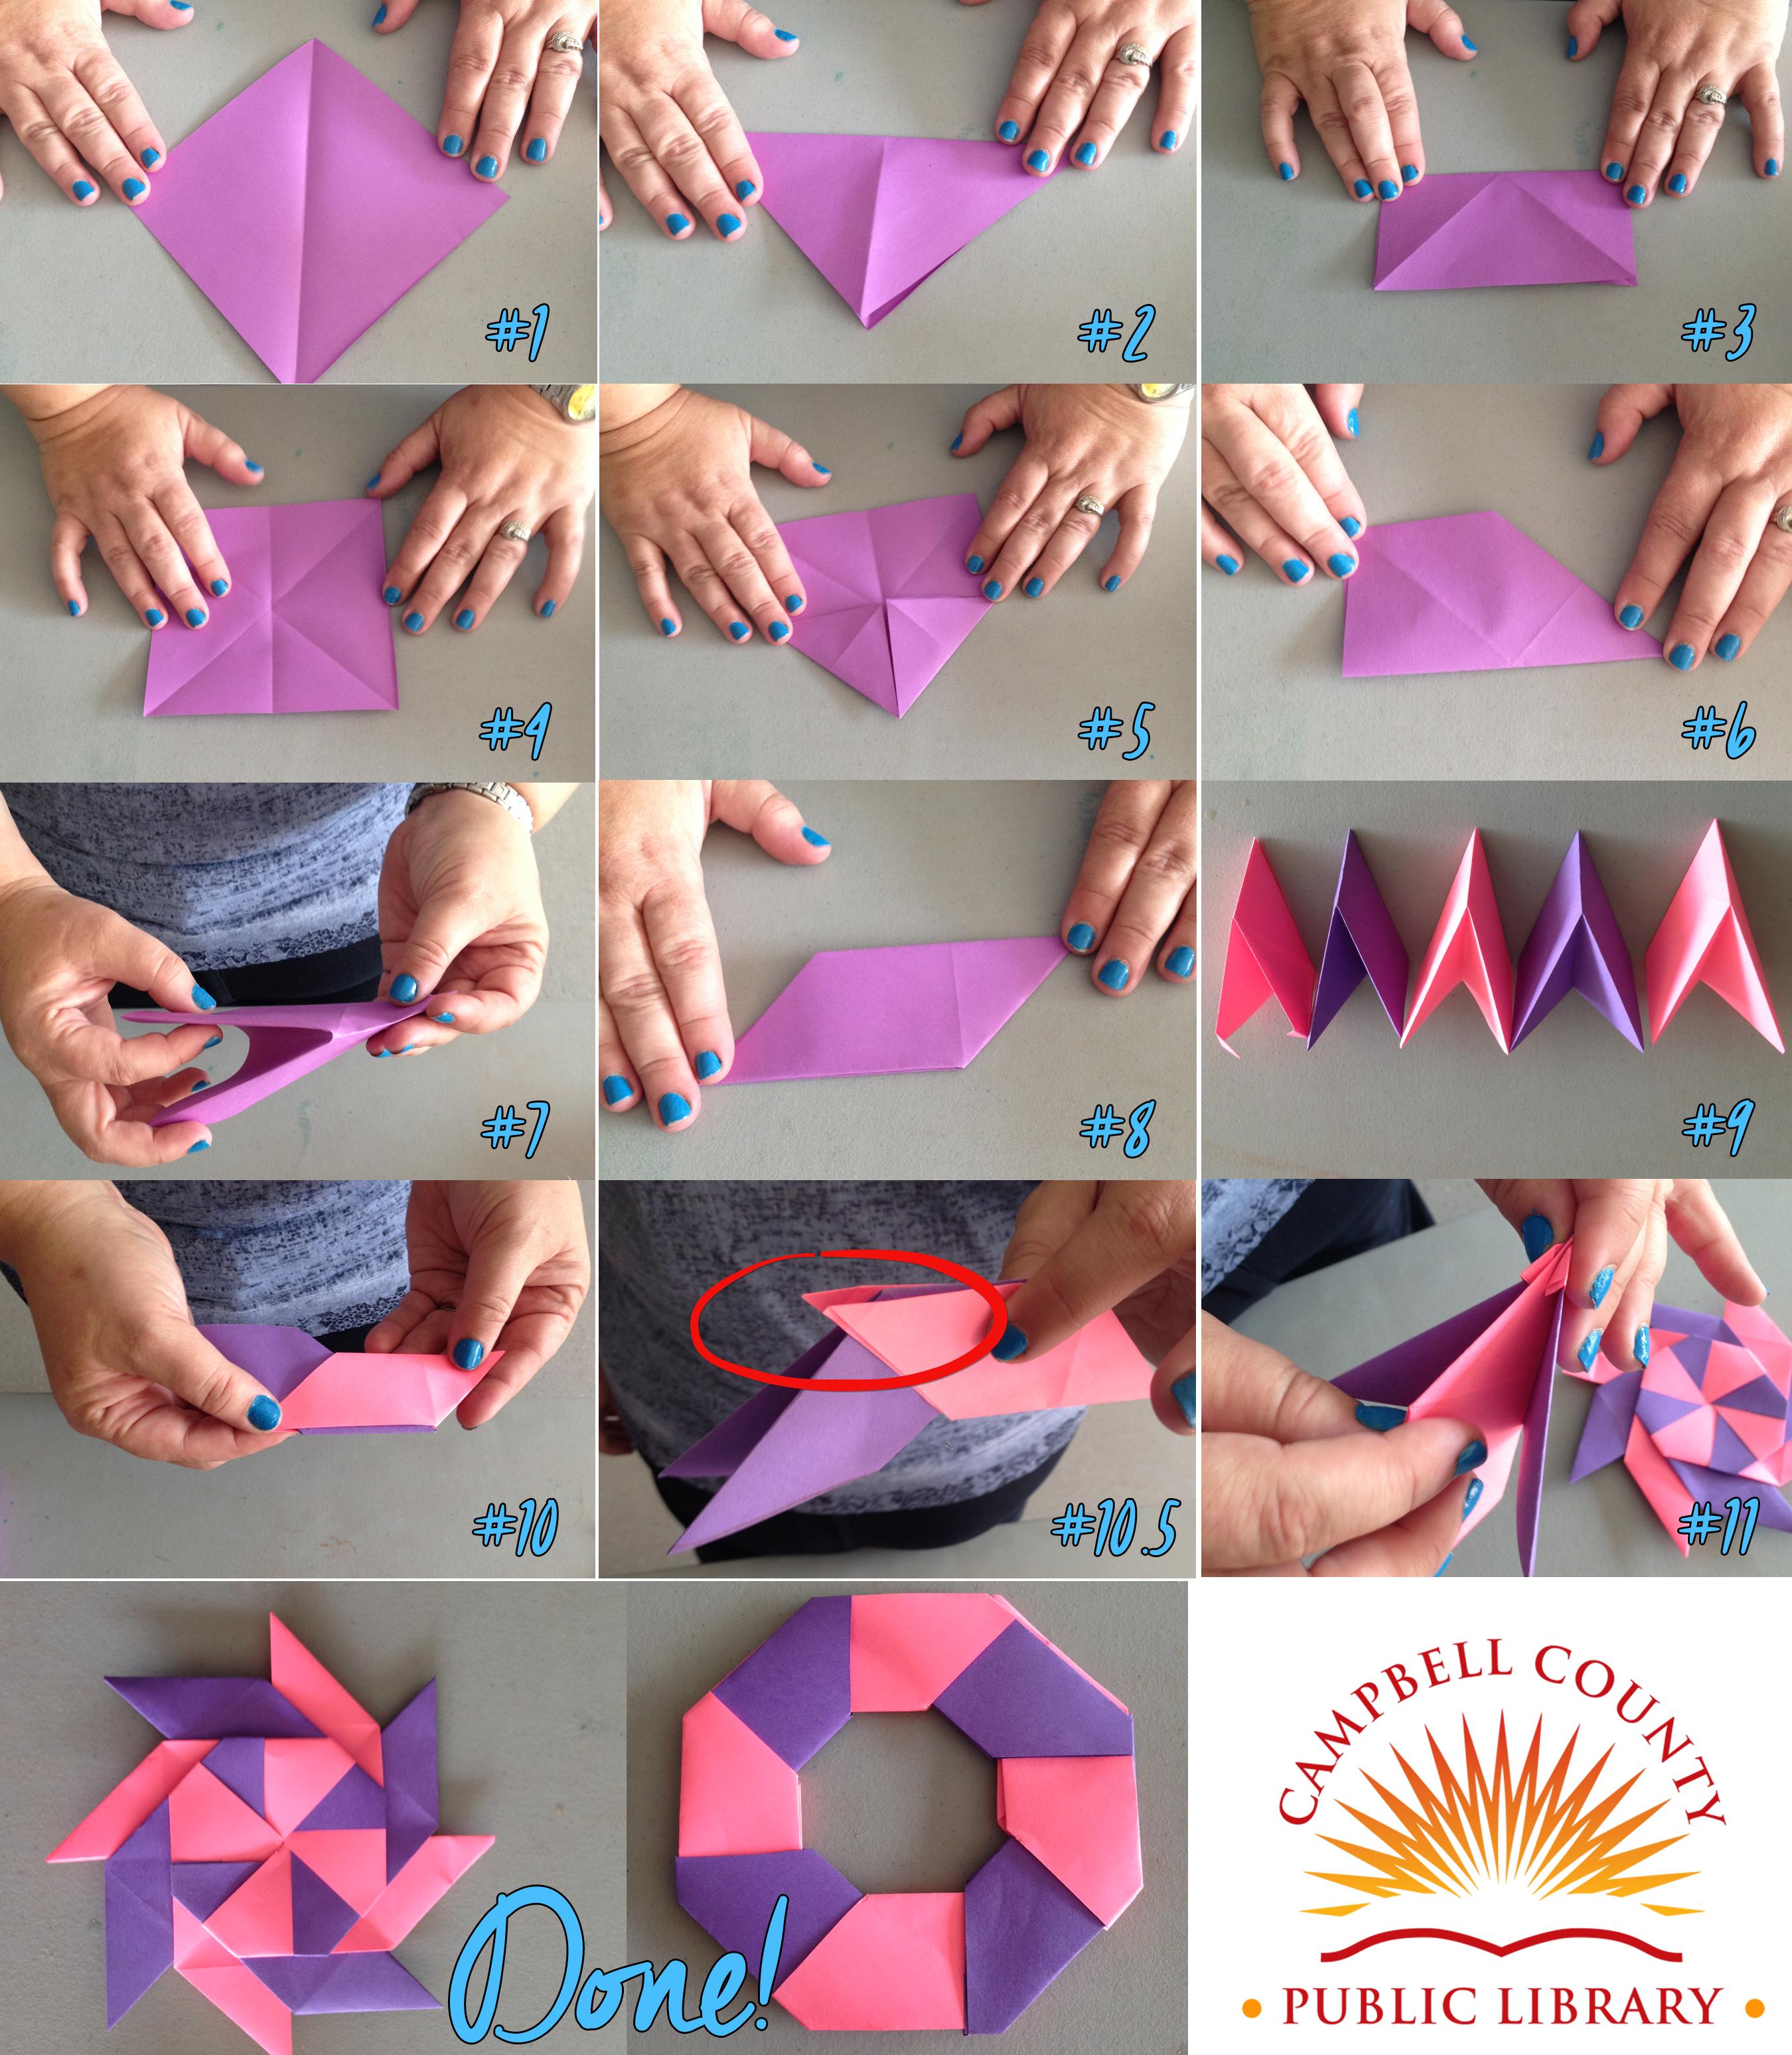 How To Make a Paper Ninja Star 2 (Shuriken) - Origami - YouTube | 3096x2700